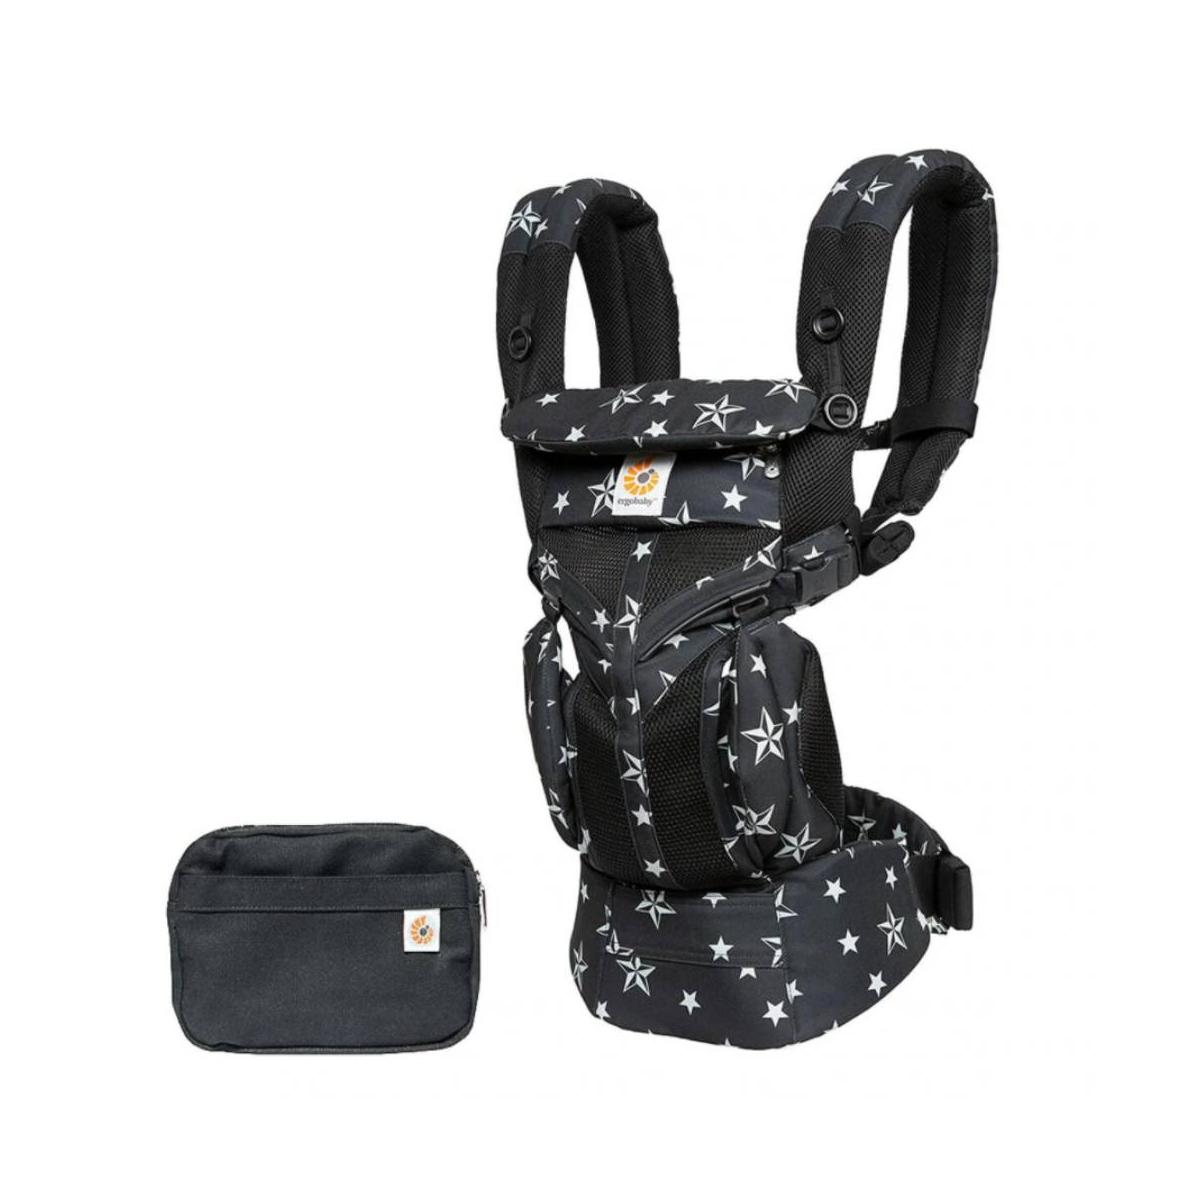 Ergobaby Omni 360 Cool Air Mesh Baby Carrier-Black Stars (2020)